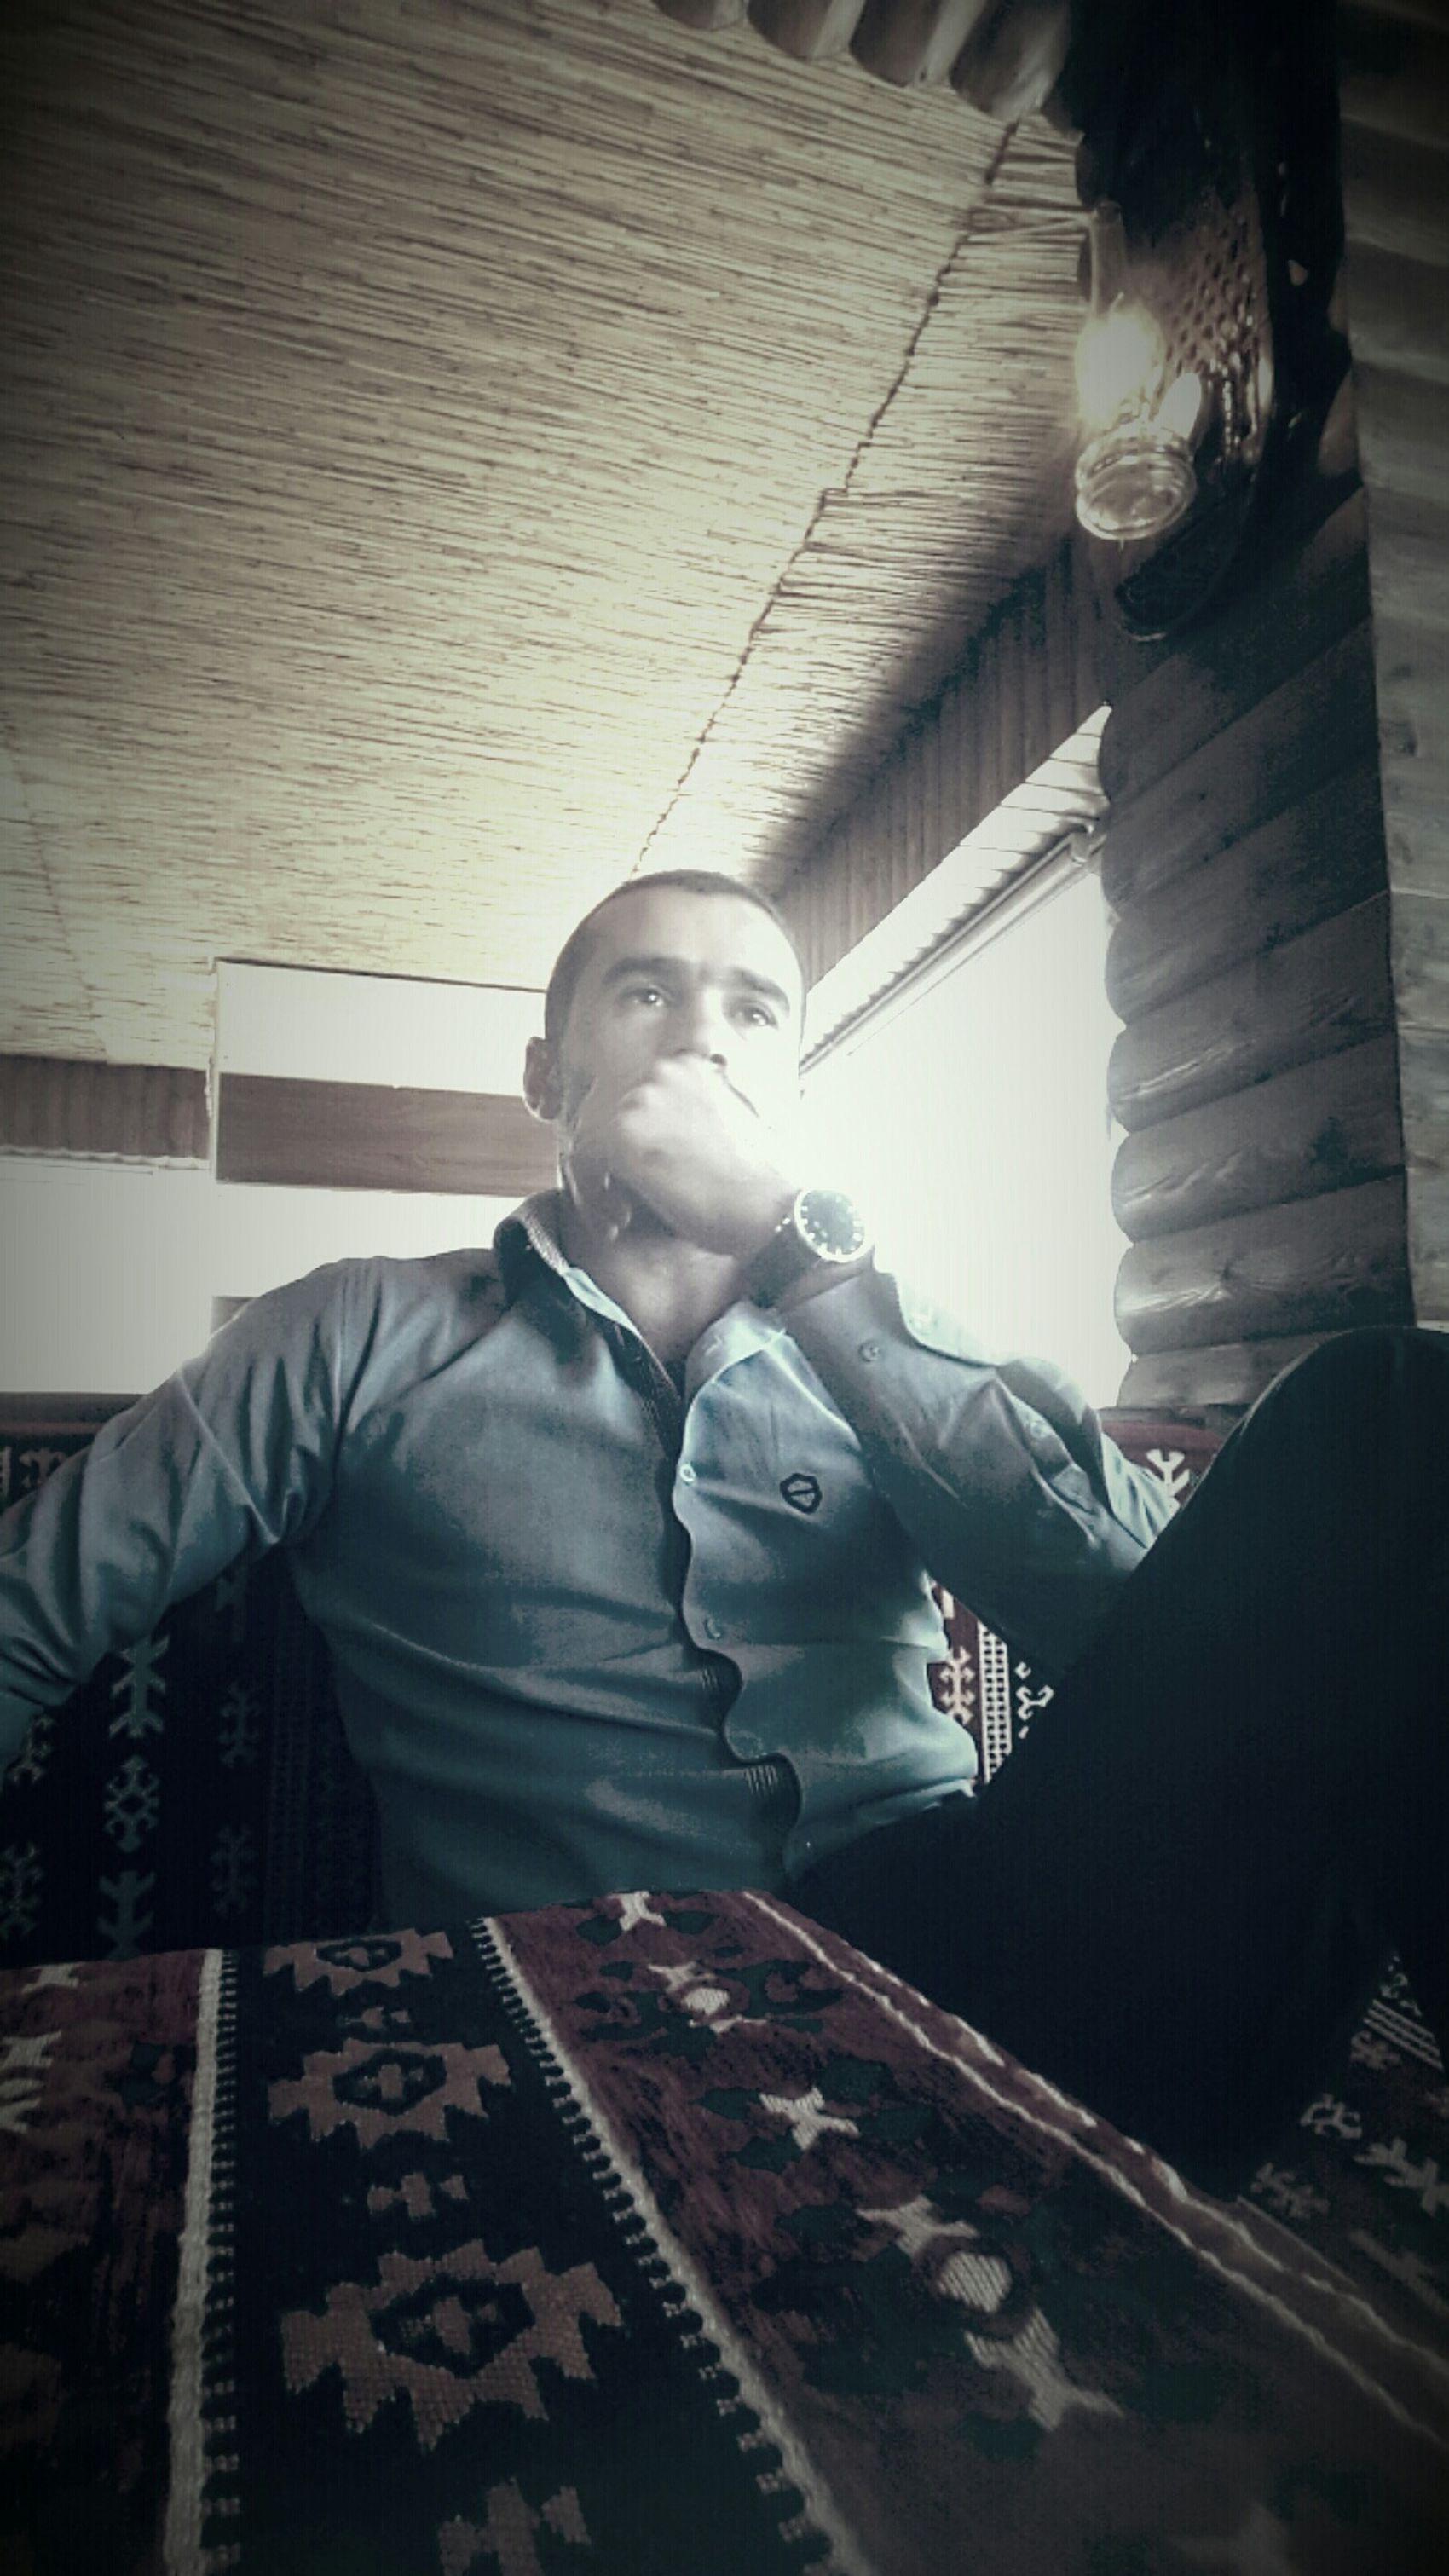 Guvercin Güveçte 😀